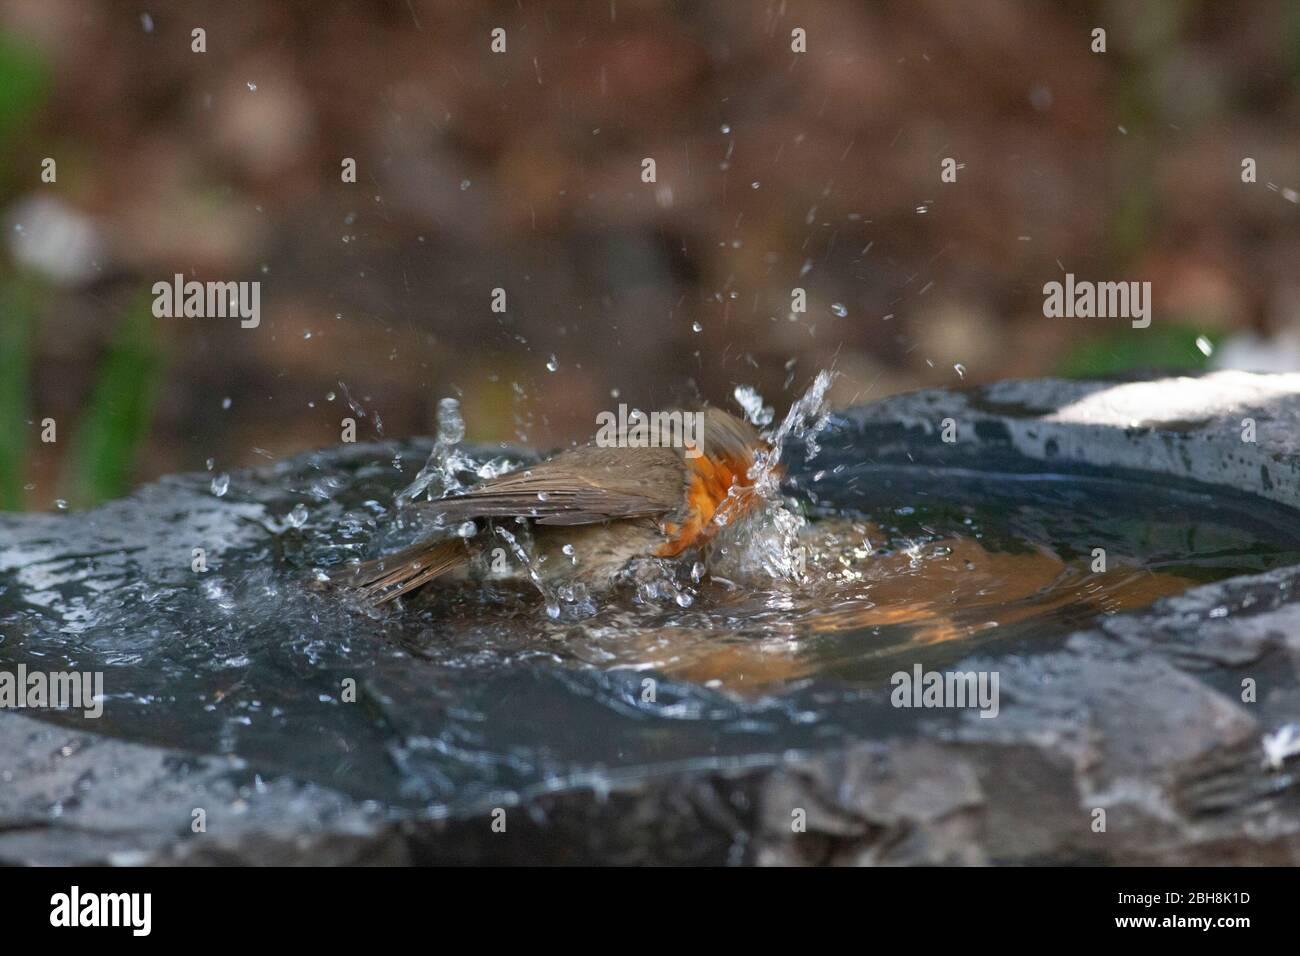 London, UK, 24 April 2020: a robin washes in a slate birdbath in a garden in Clapham. Anna Watson/Alamy Live News Stock Photo